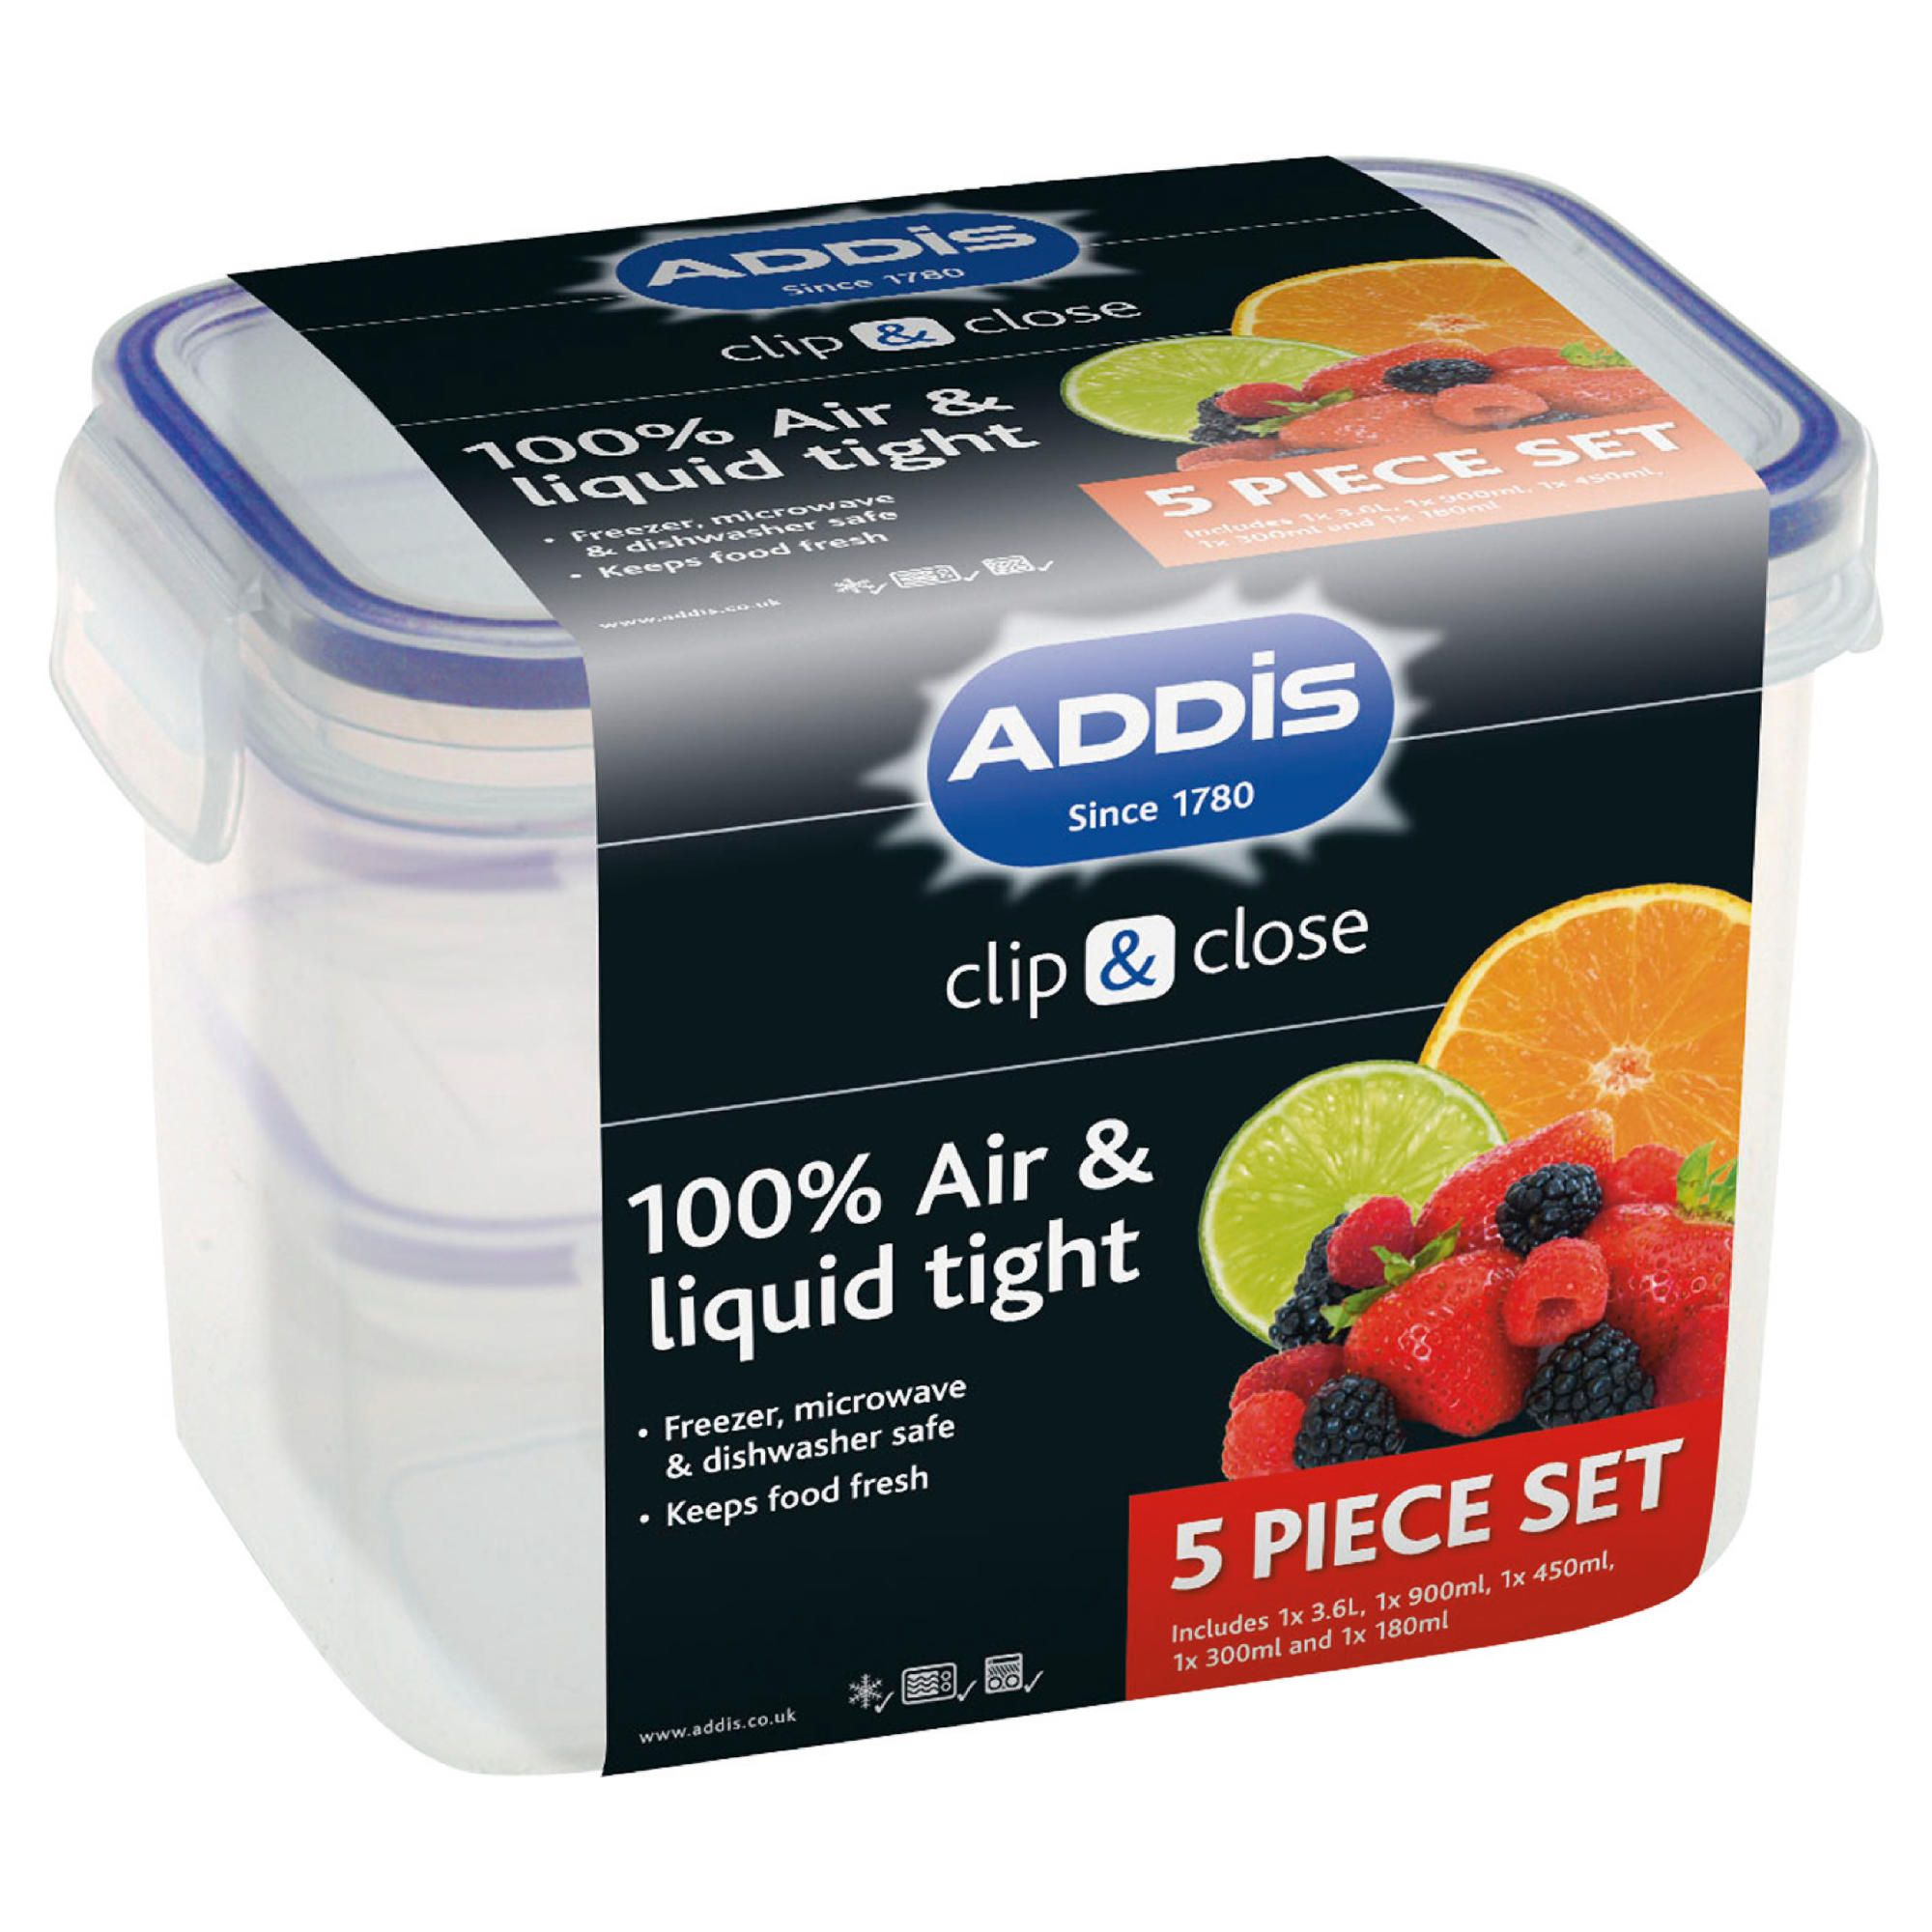 Addis 5 piece food storage set, clear